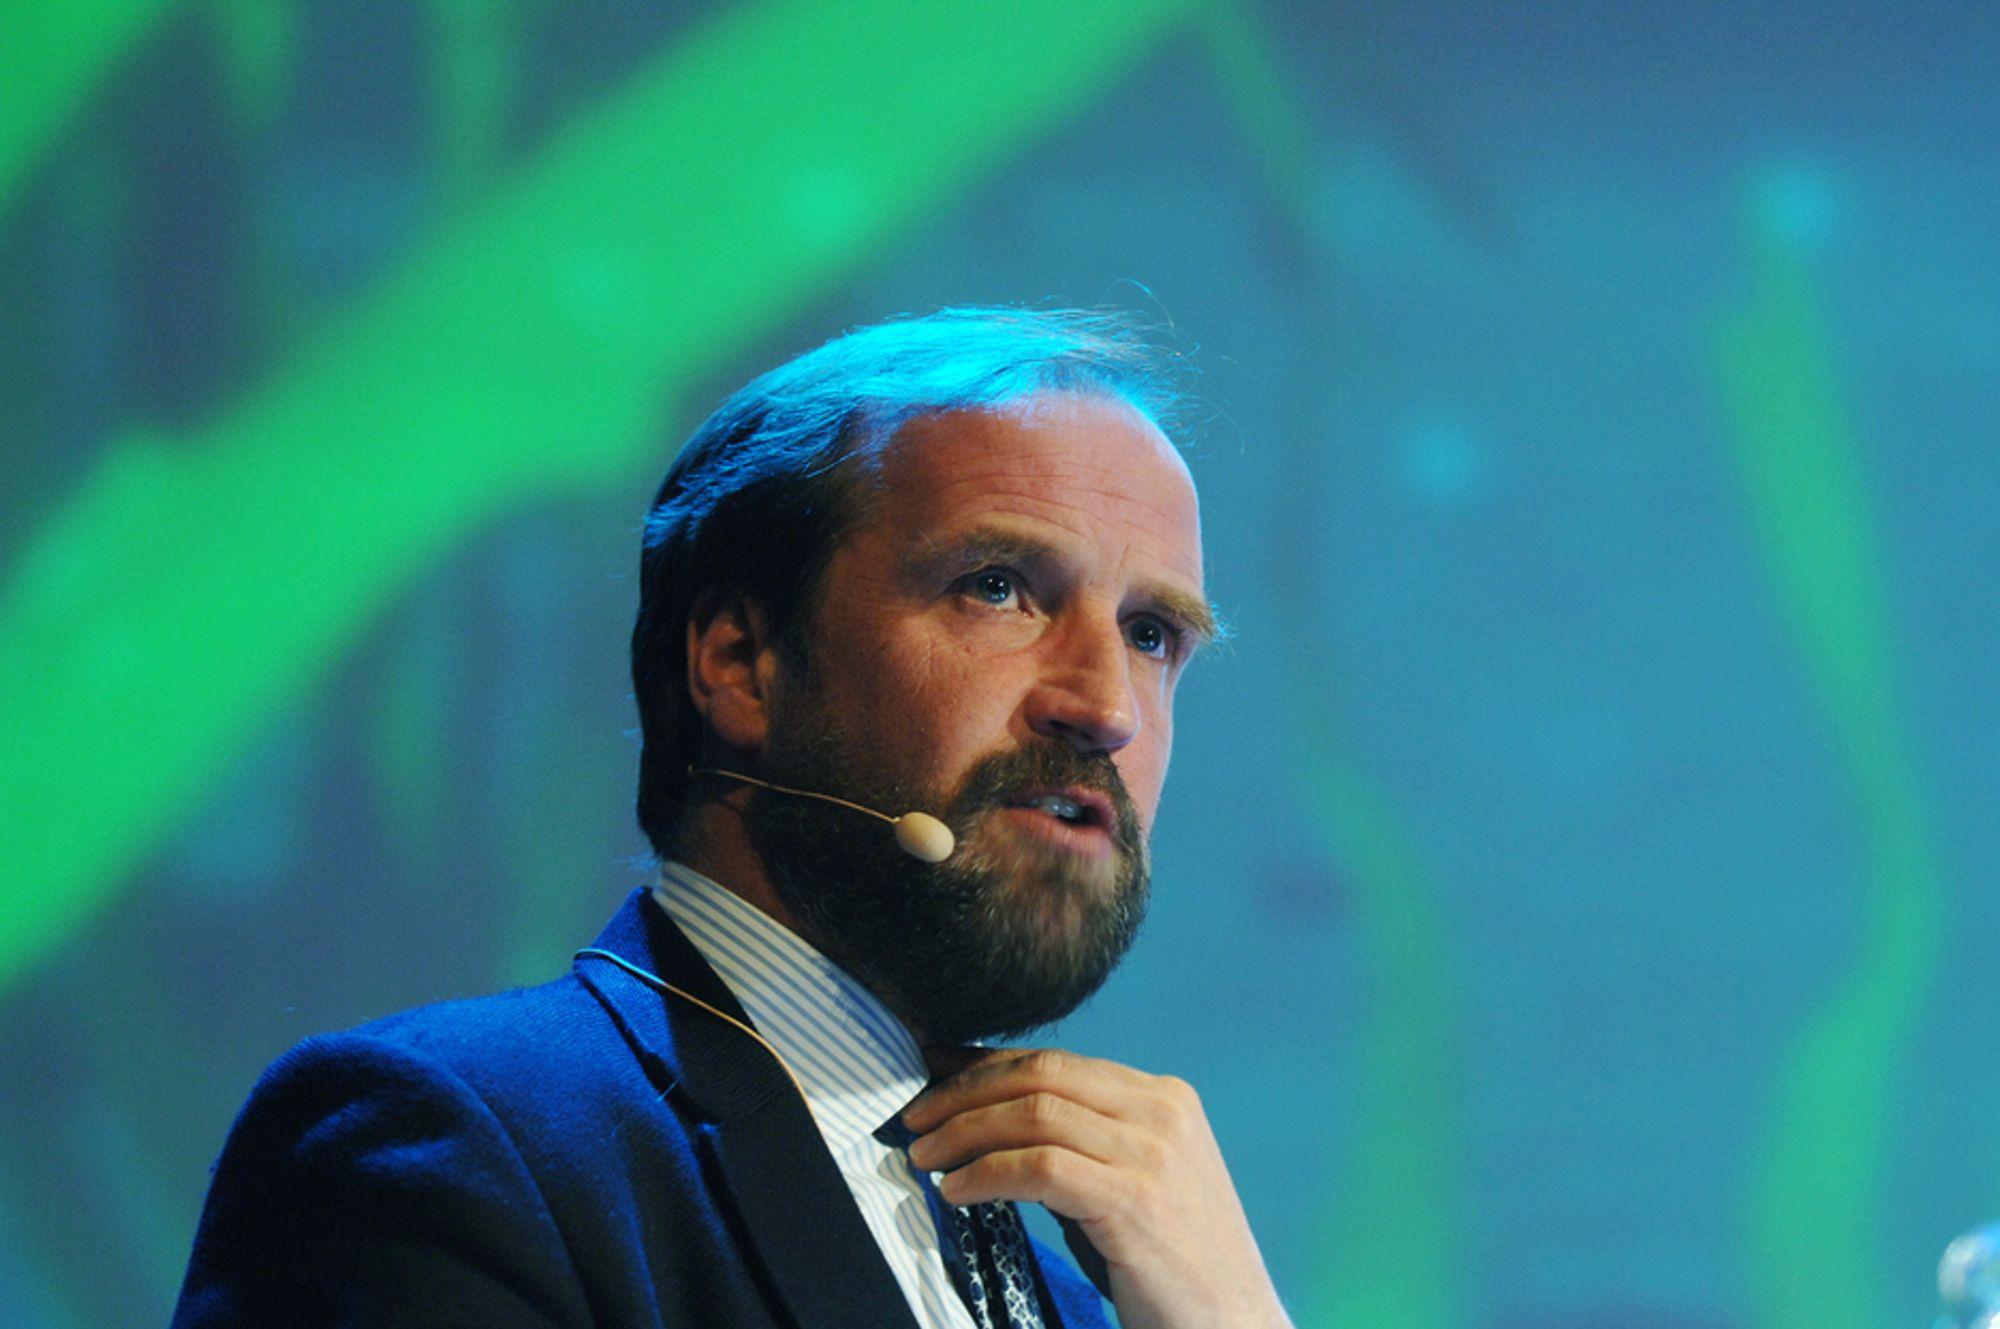 Philip Lambert tror ikke oljeepoken i Norge nærmer seg slutten.